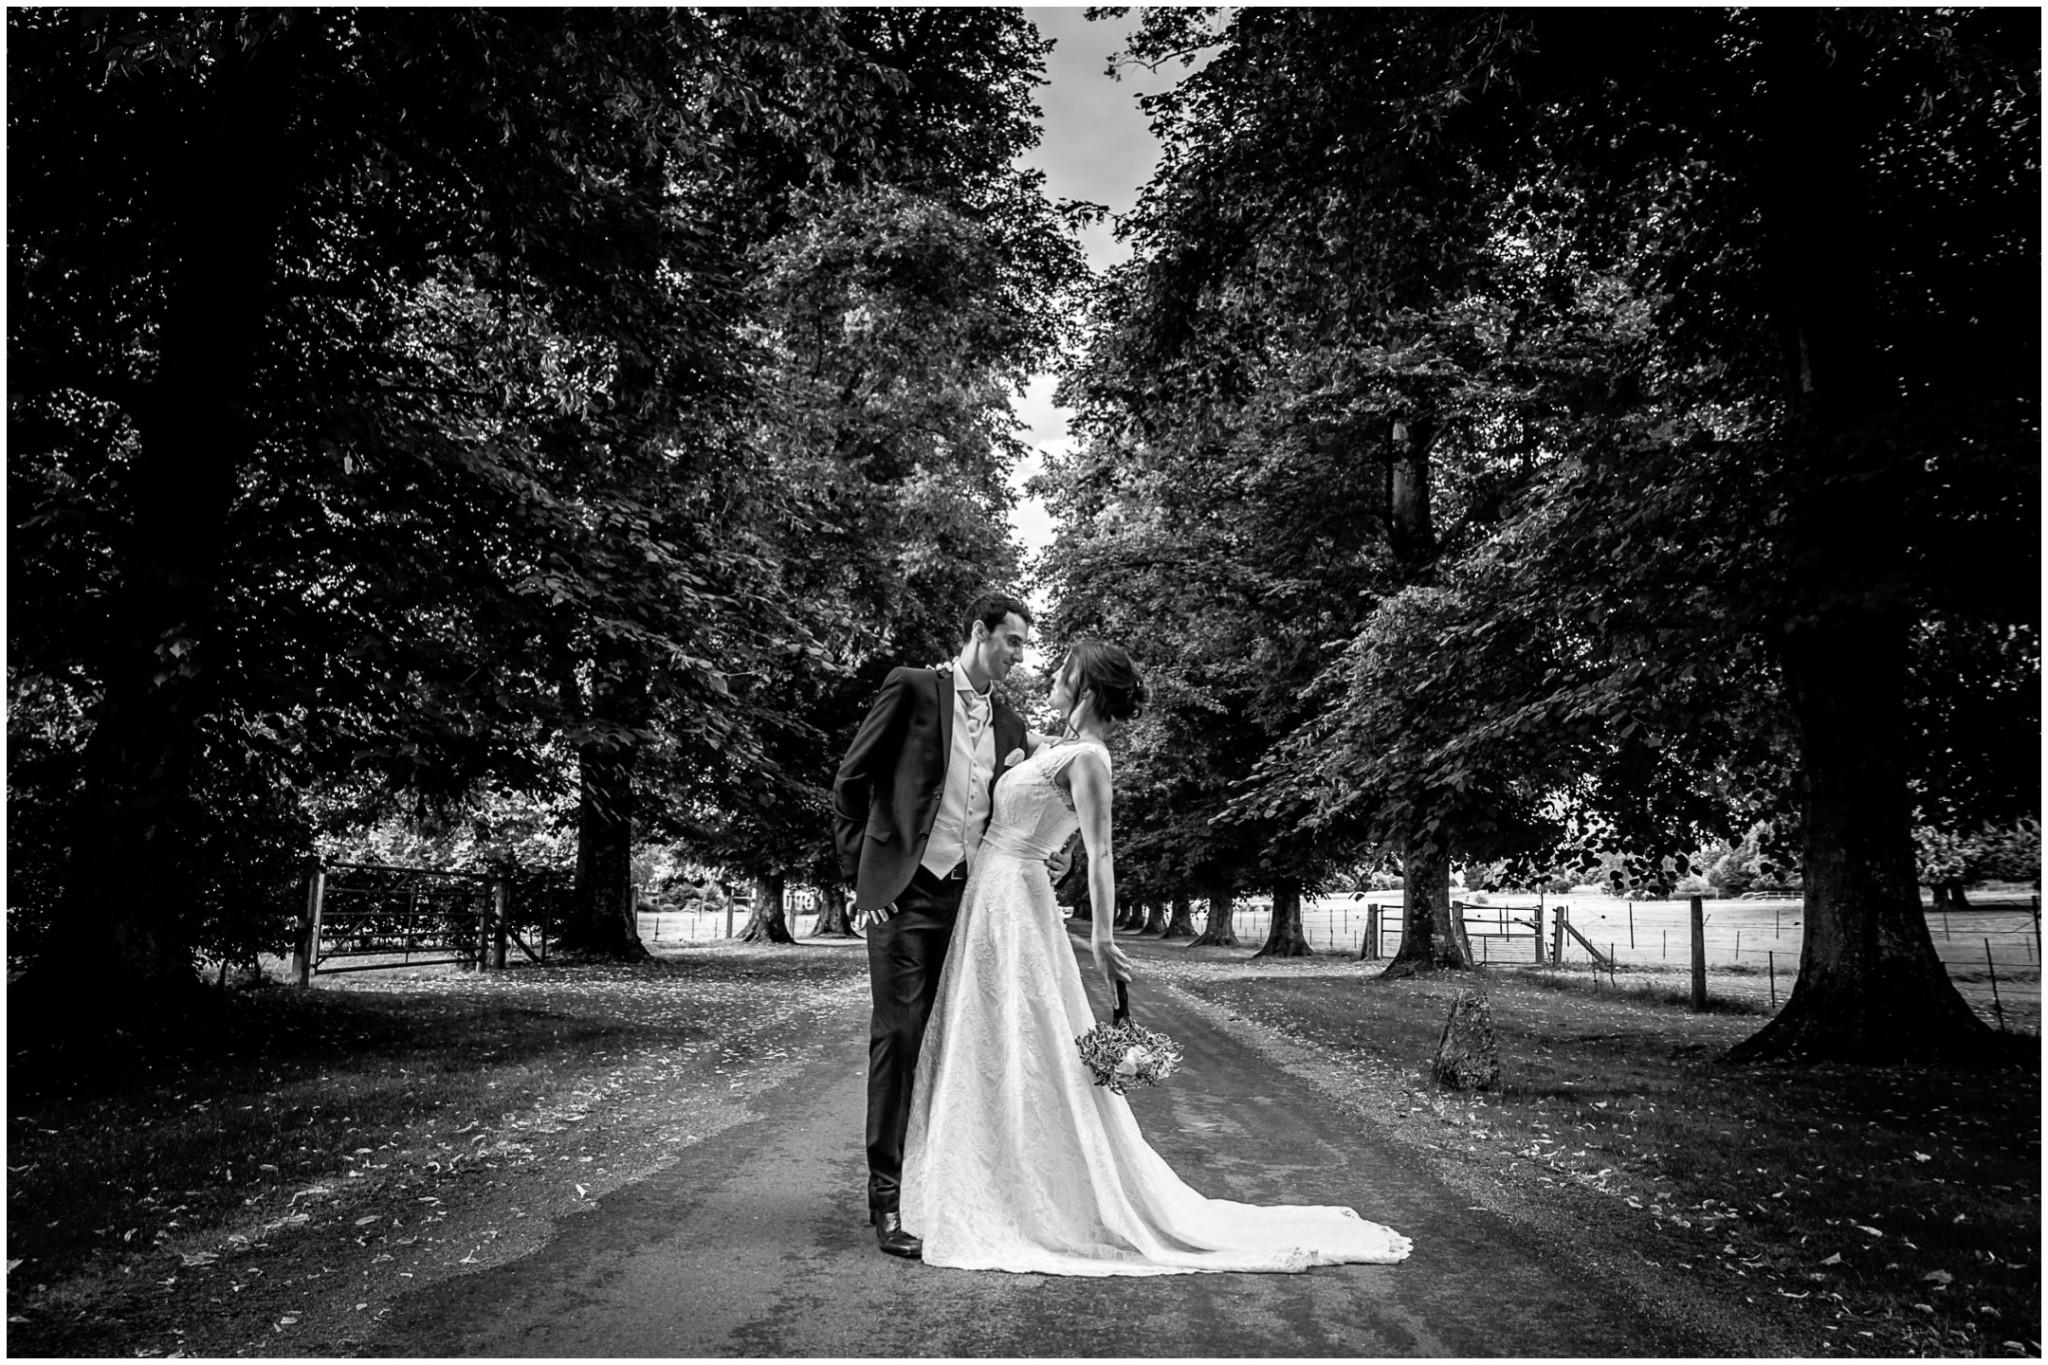 Avington Park Wedding Photographer Bride & Groom in Avenue of Trees 002